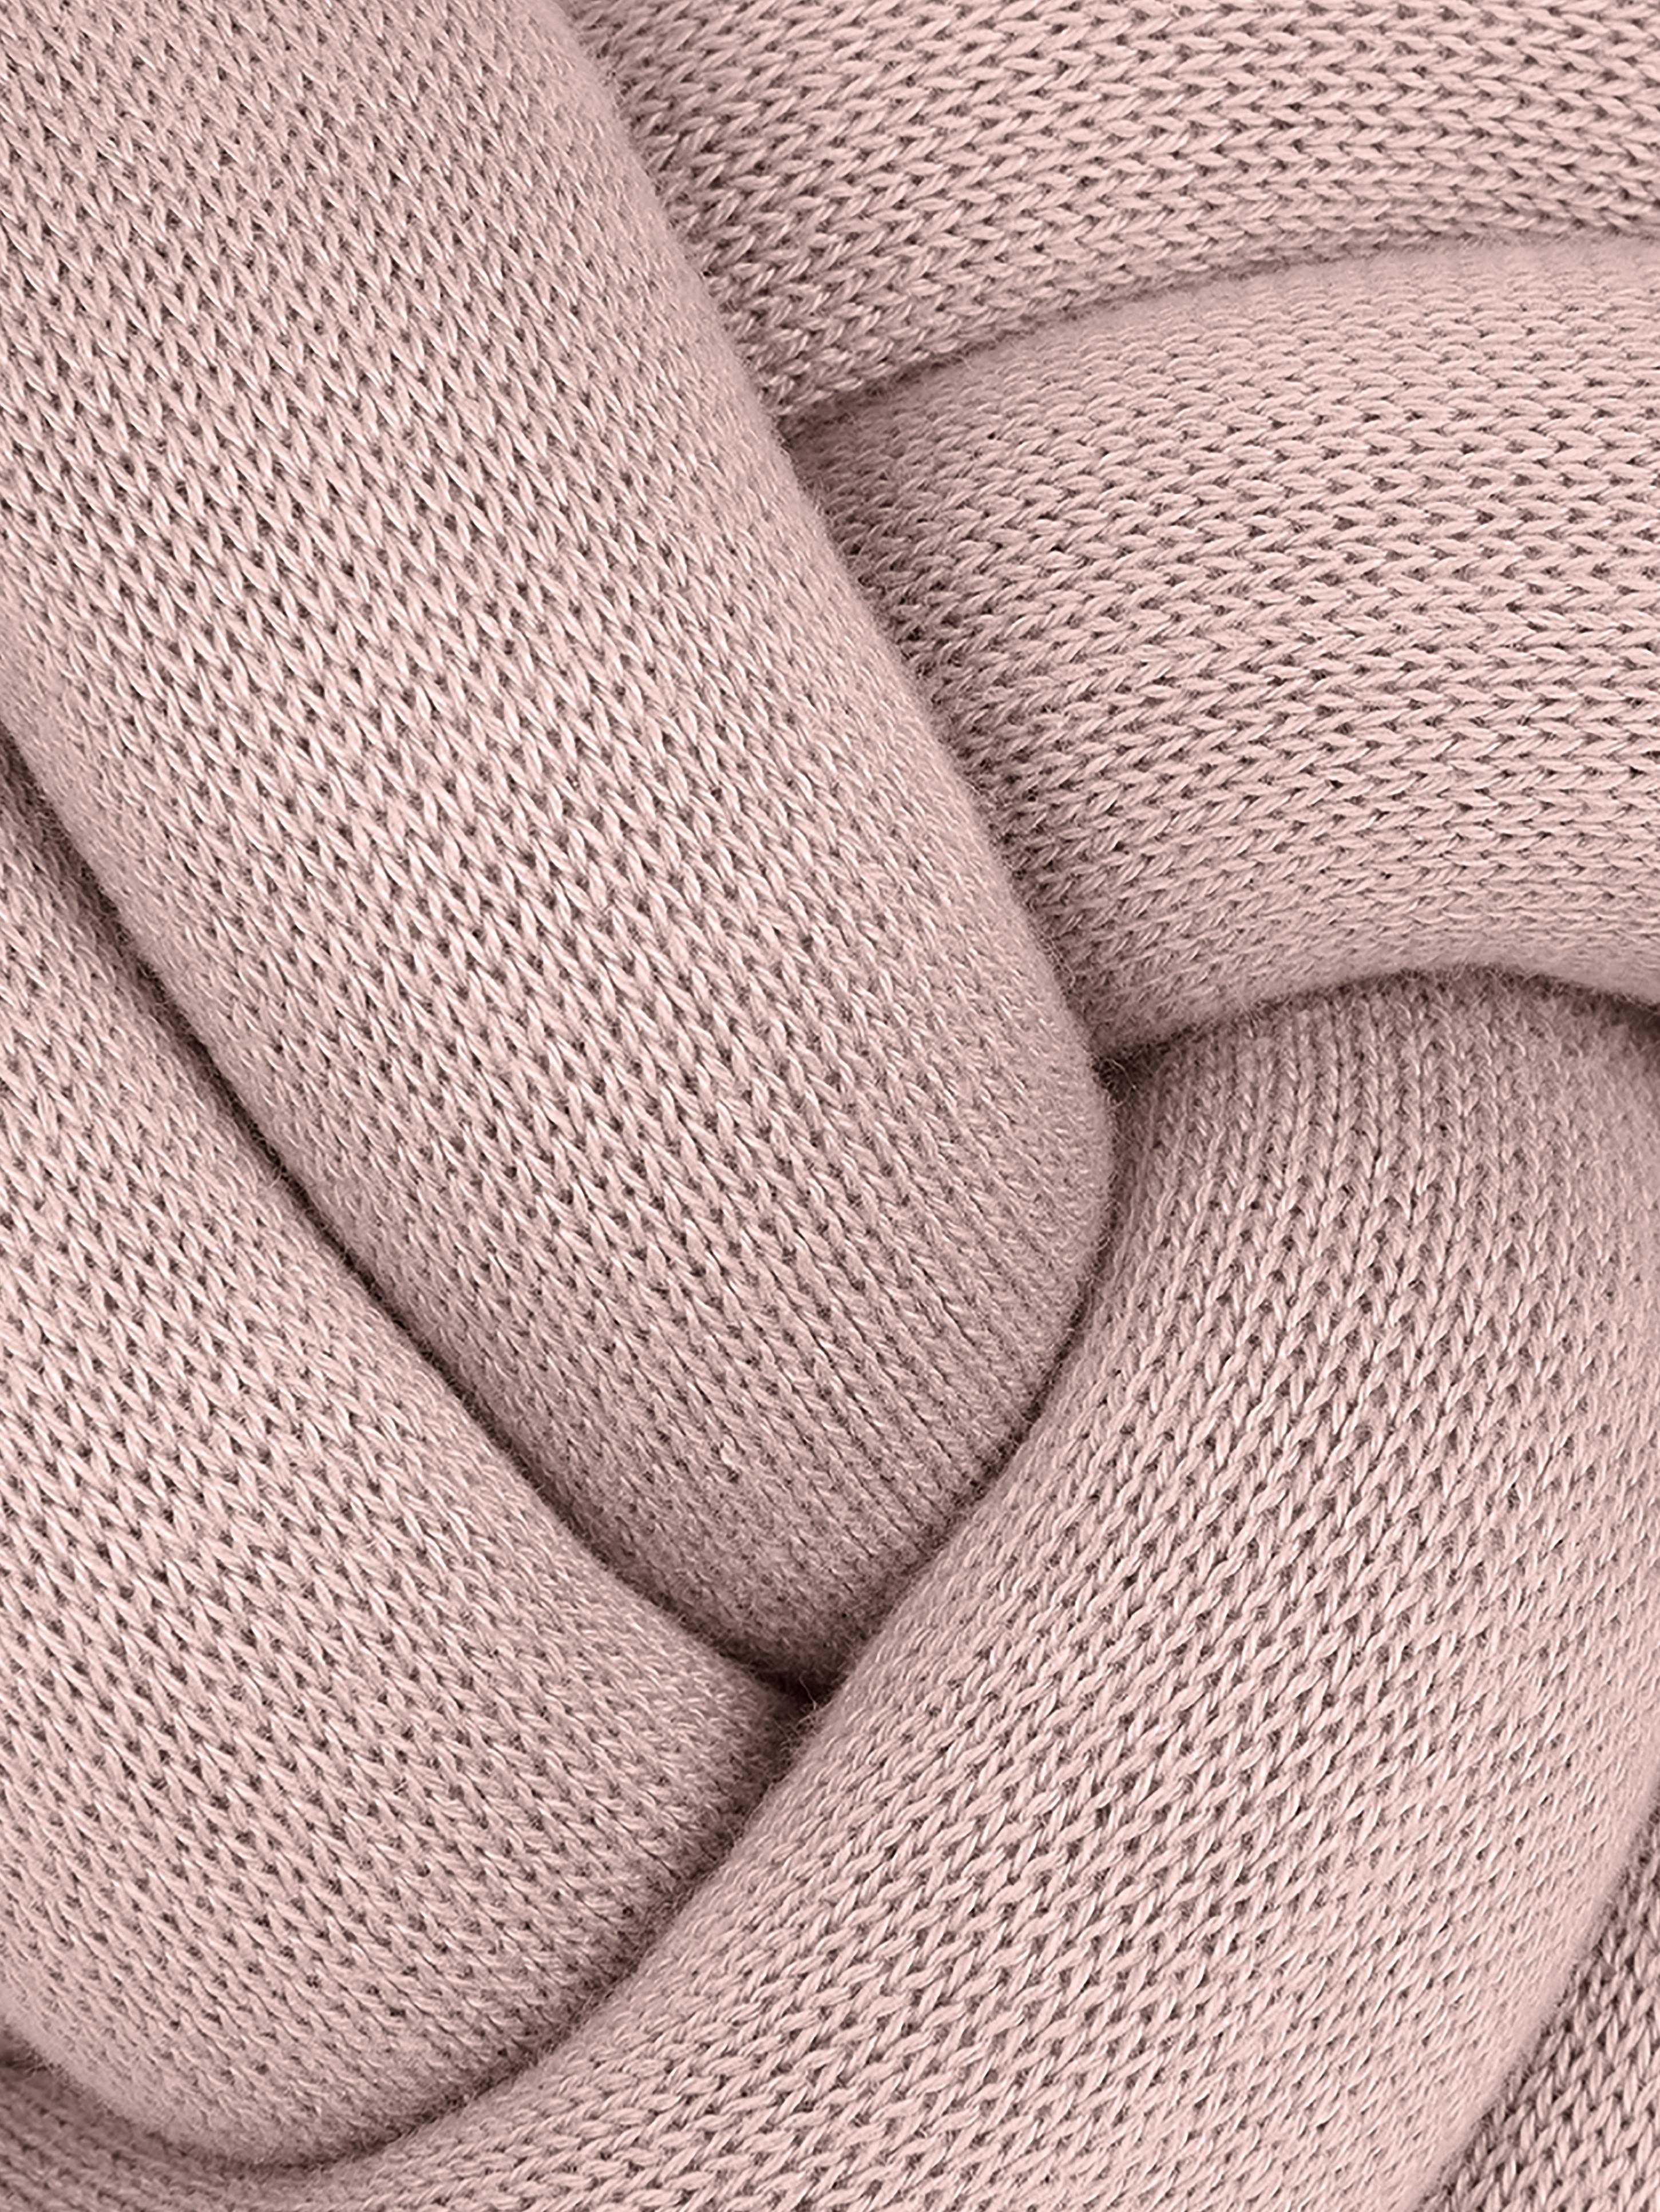 Cuscino rosa Twist, Rosa, Ø 30 cm